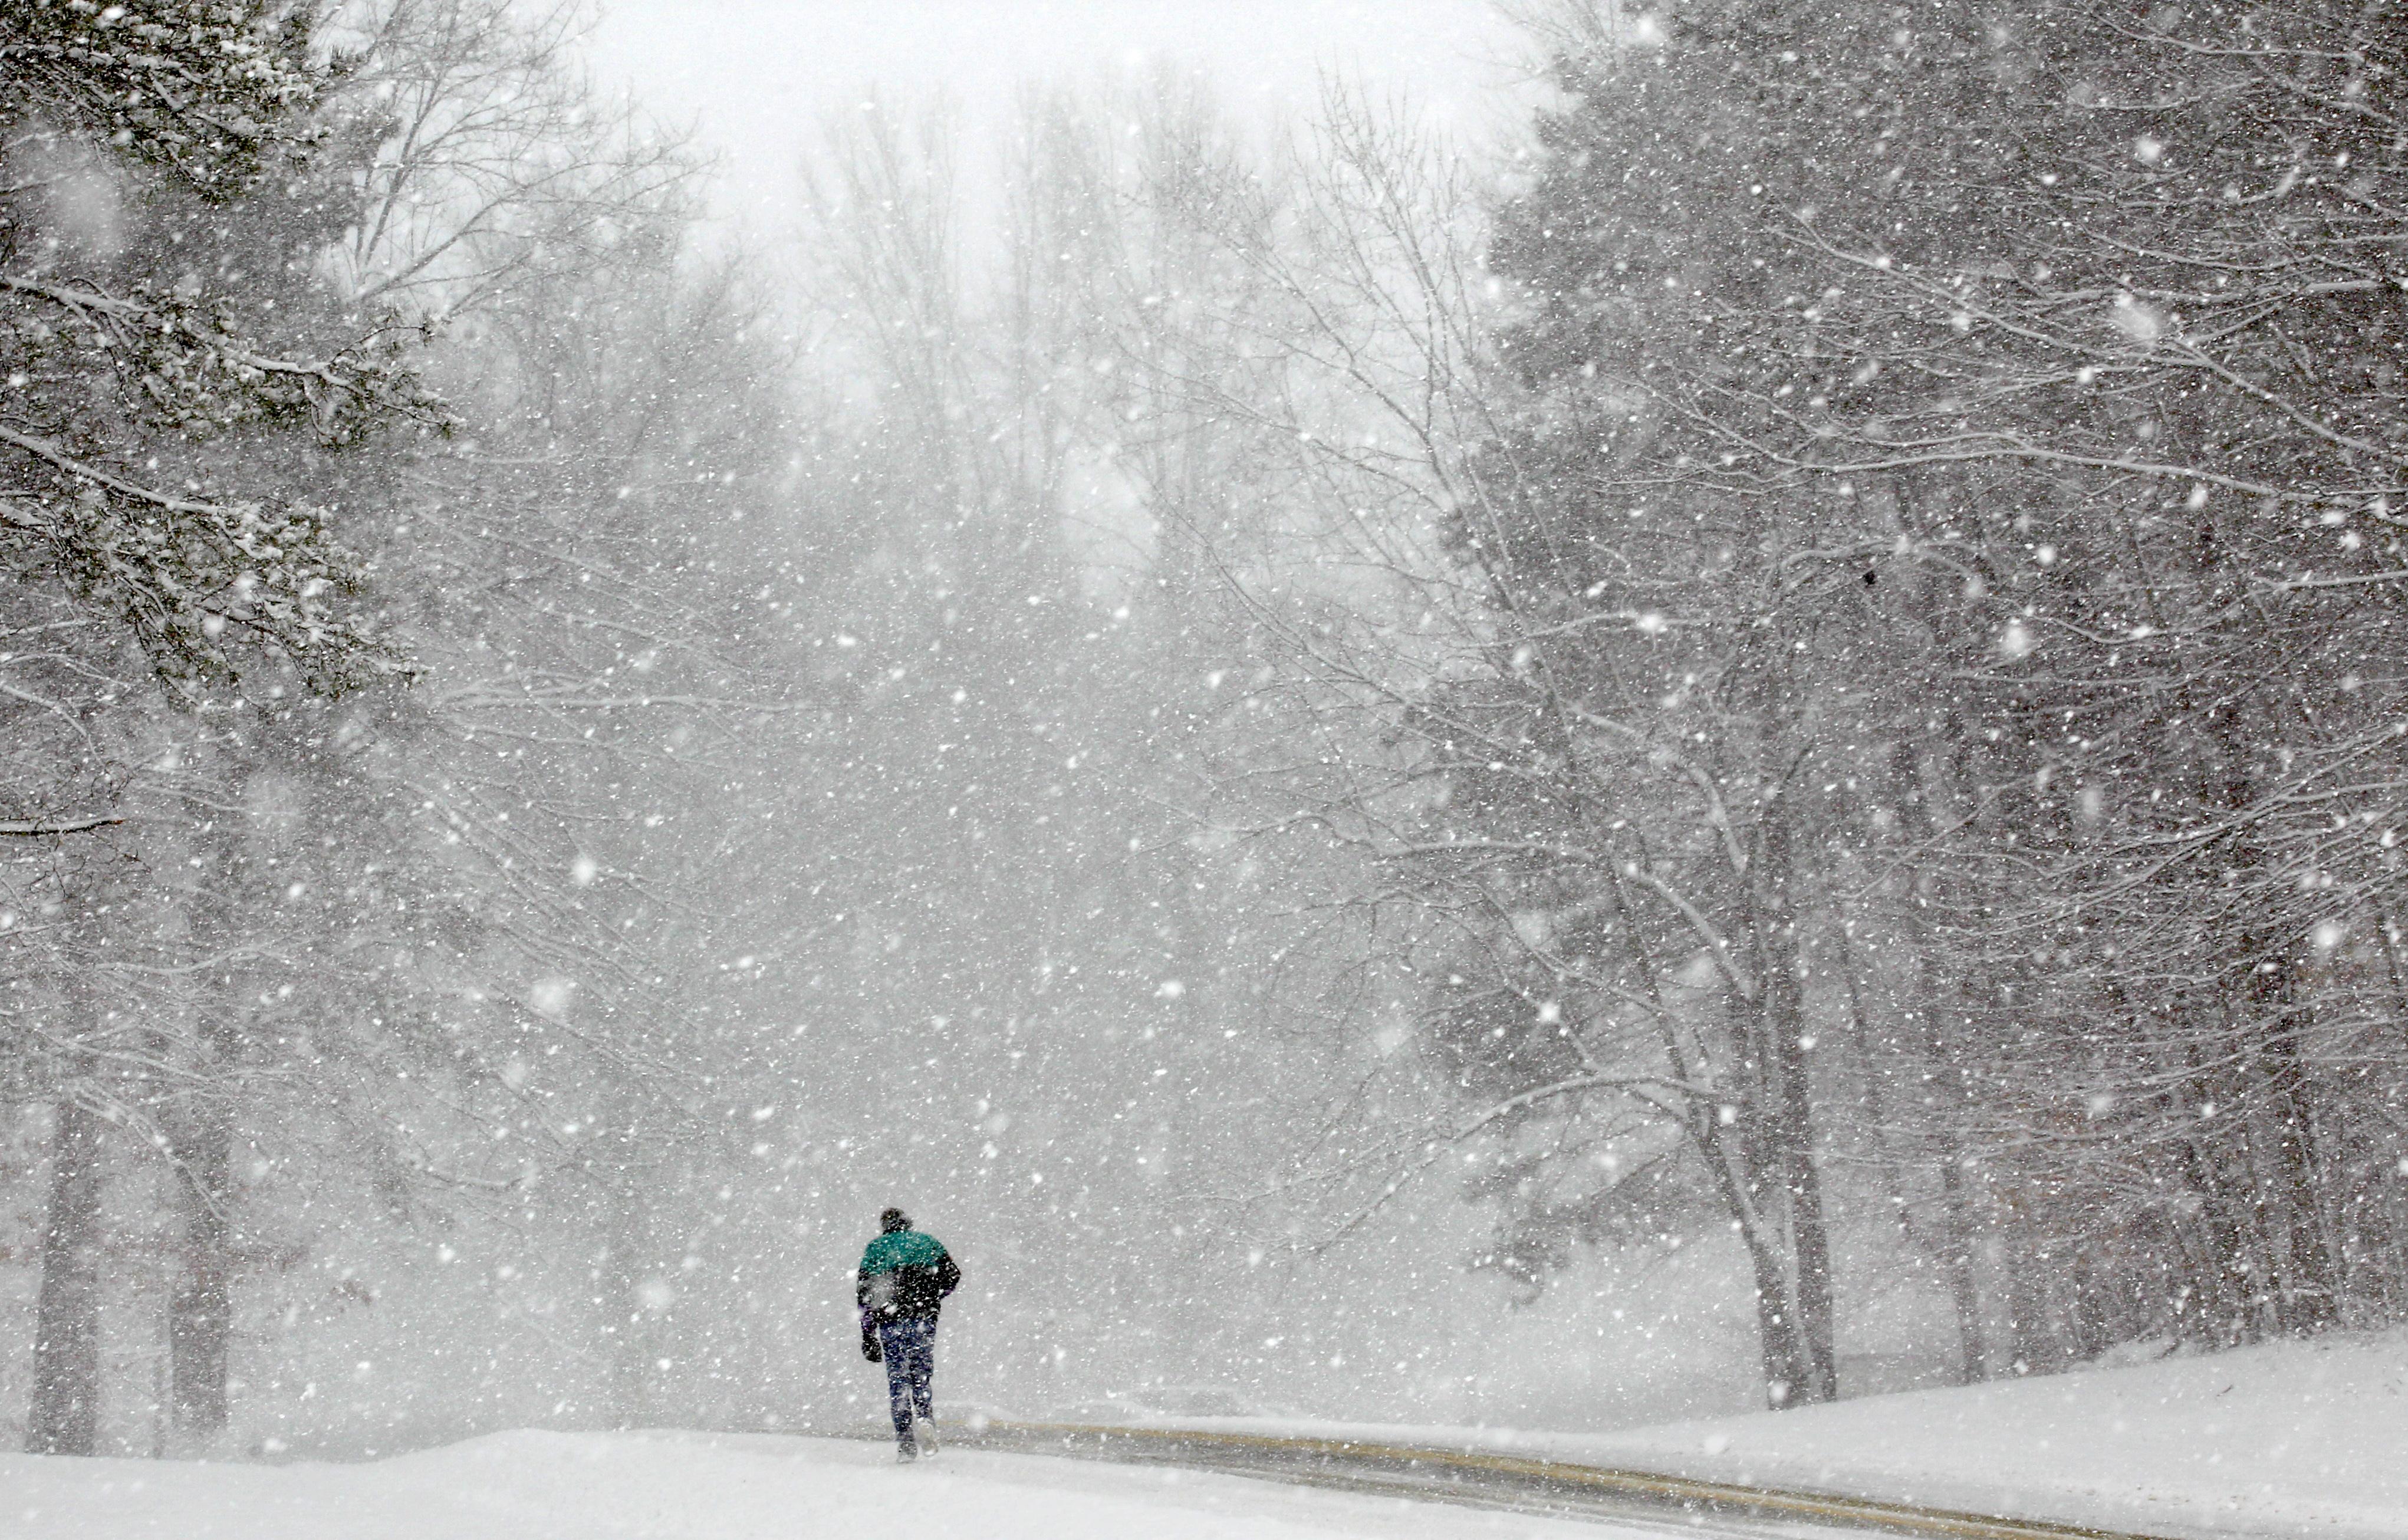 die  michigan  winter storm brings snow big winds 4084 x 2612 · jpeg